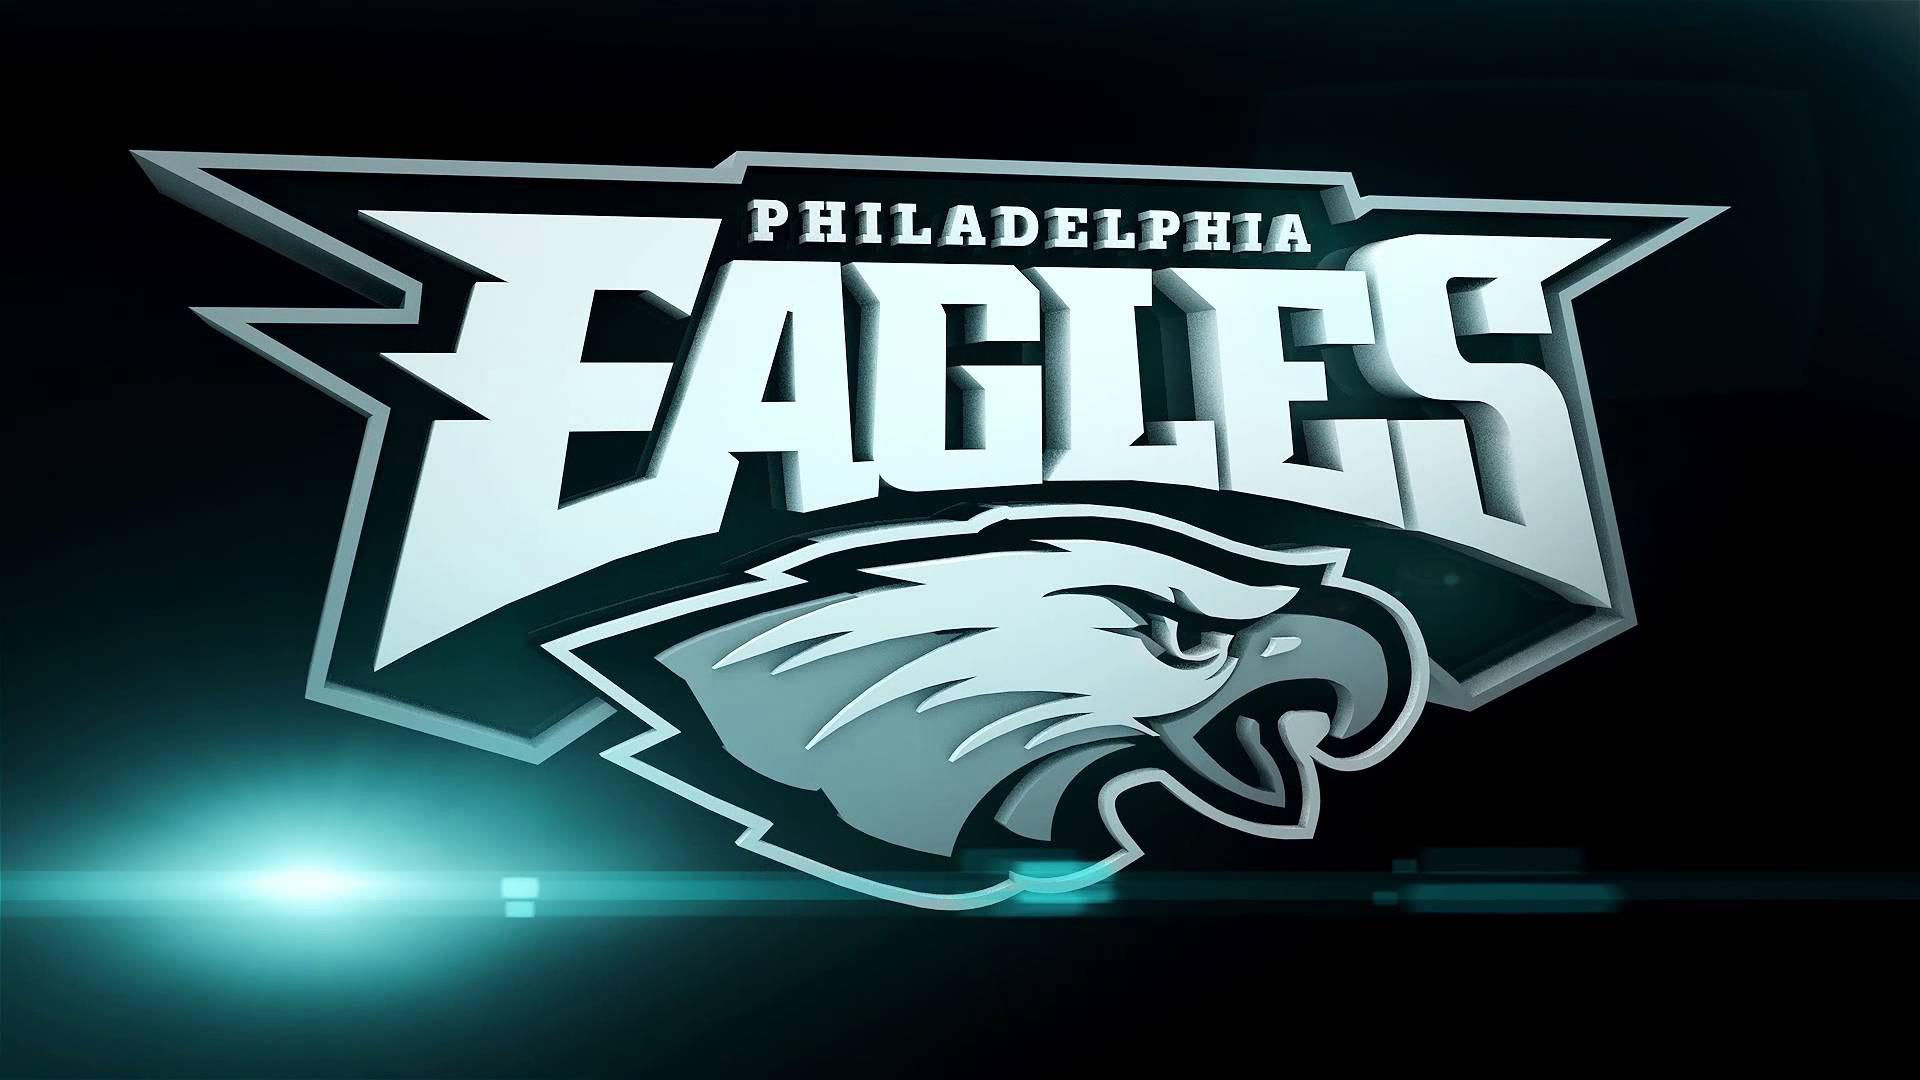 Philadelphia Eagles Desktop Wallpaper (76+ Images